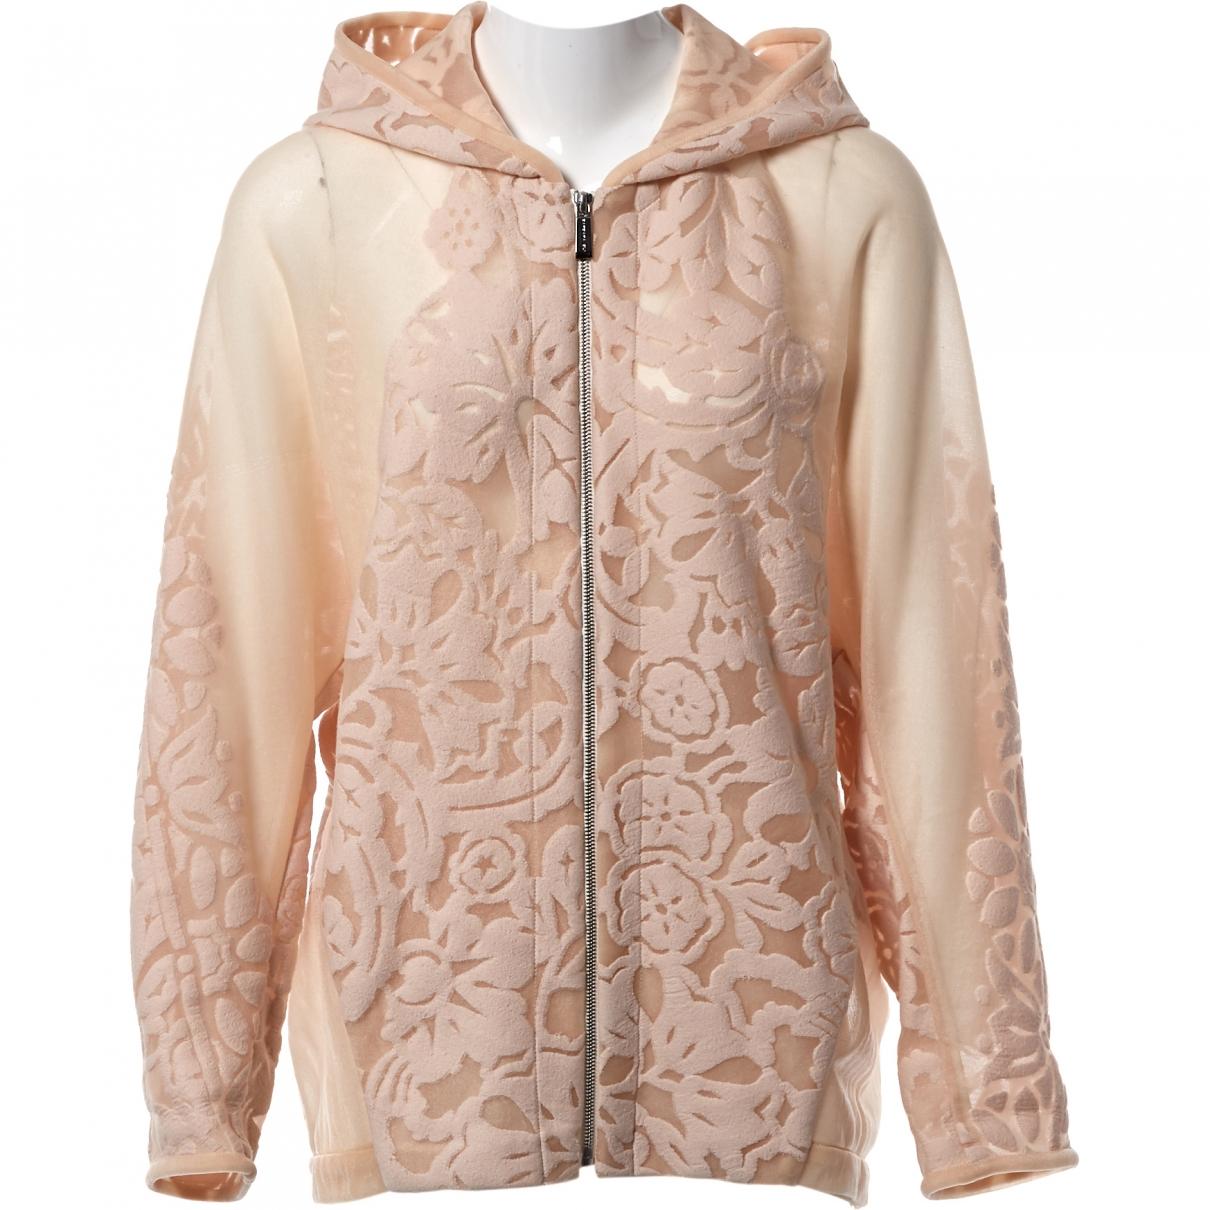 Barbara Bui \N Pink jacket for Women 38 FR